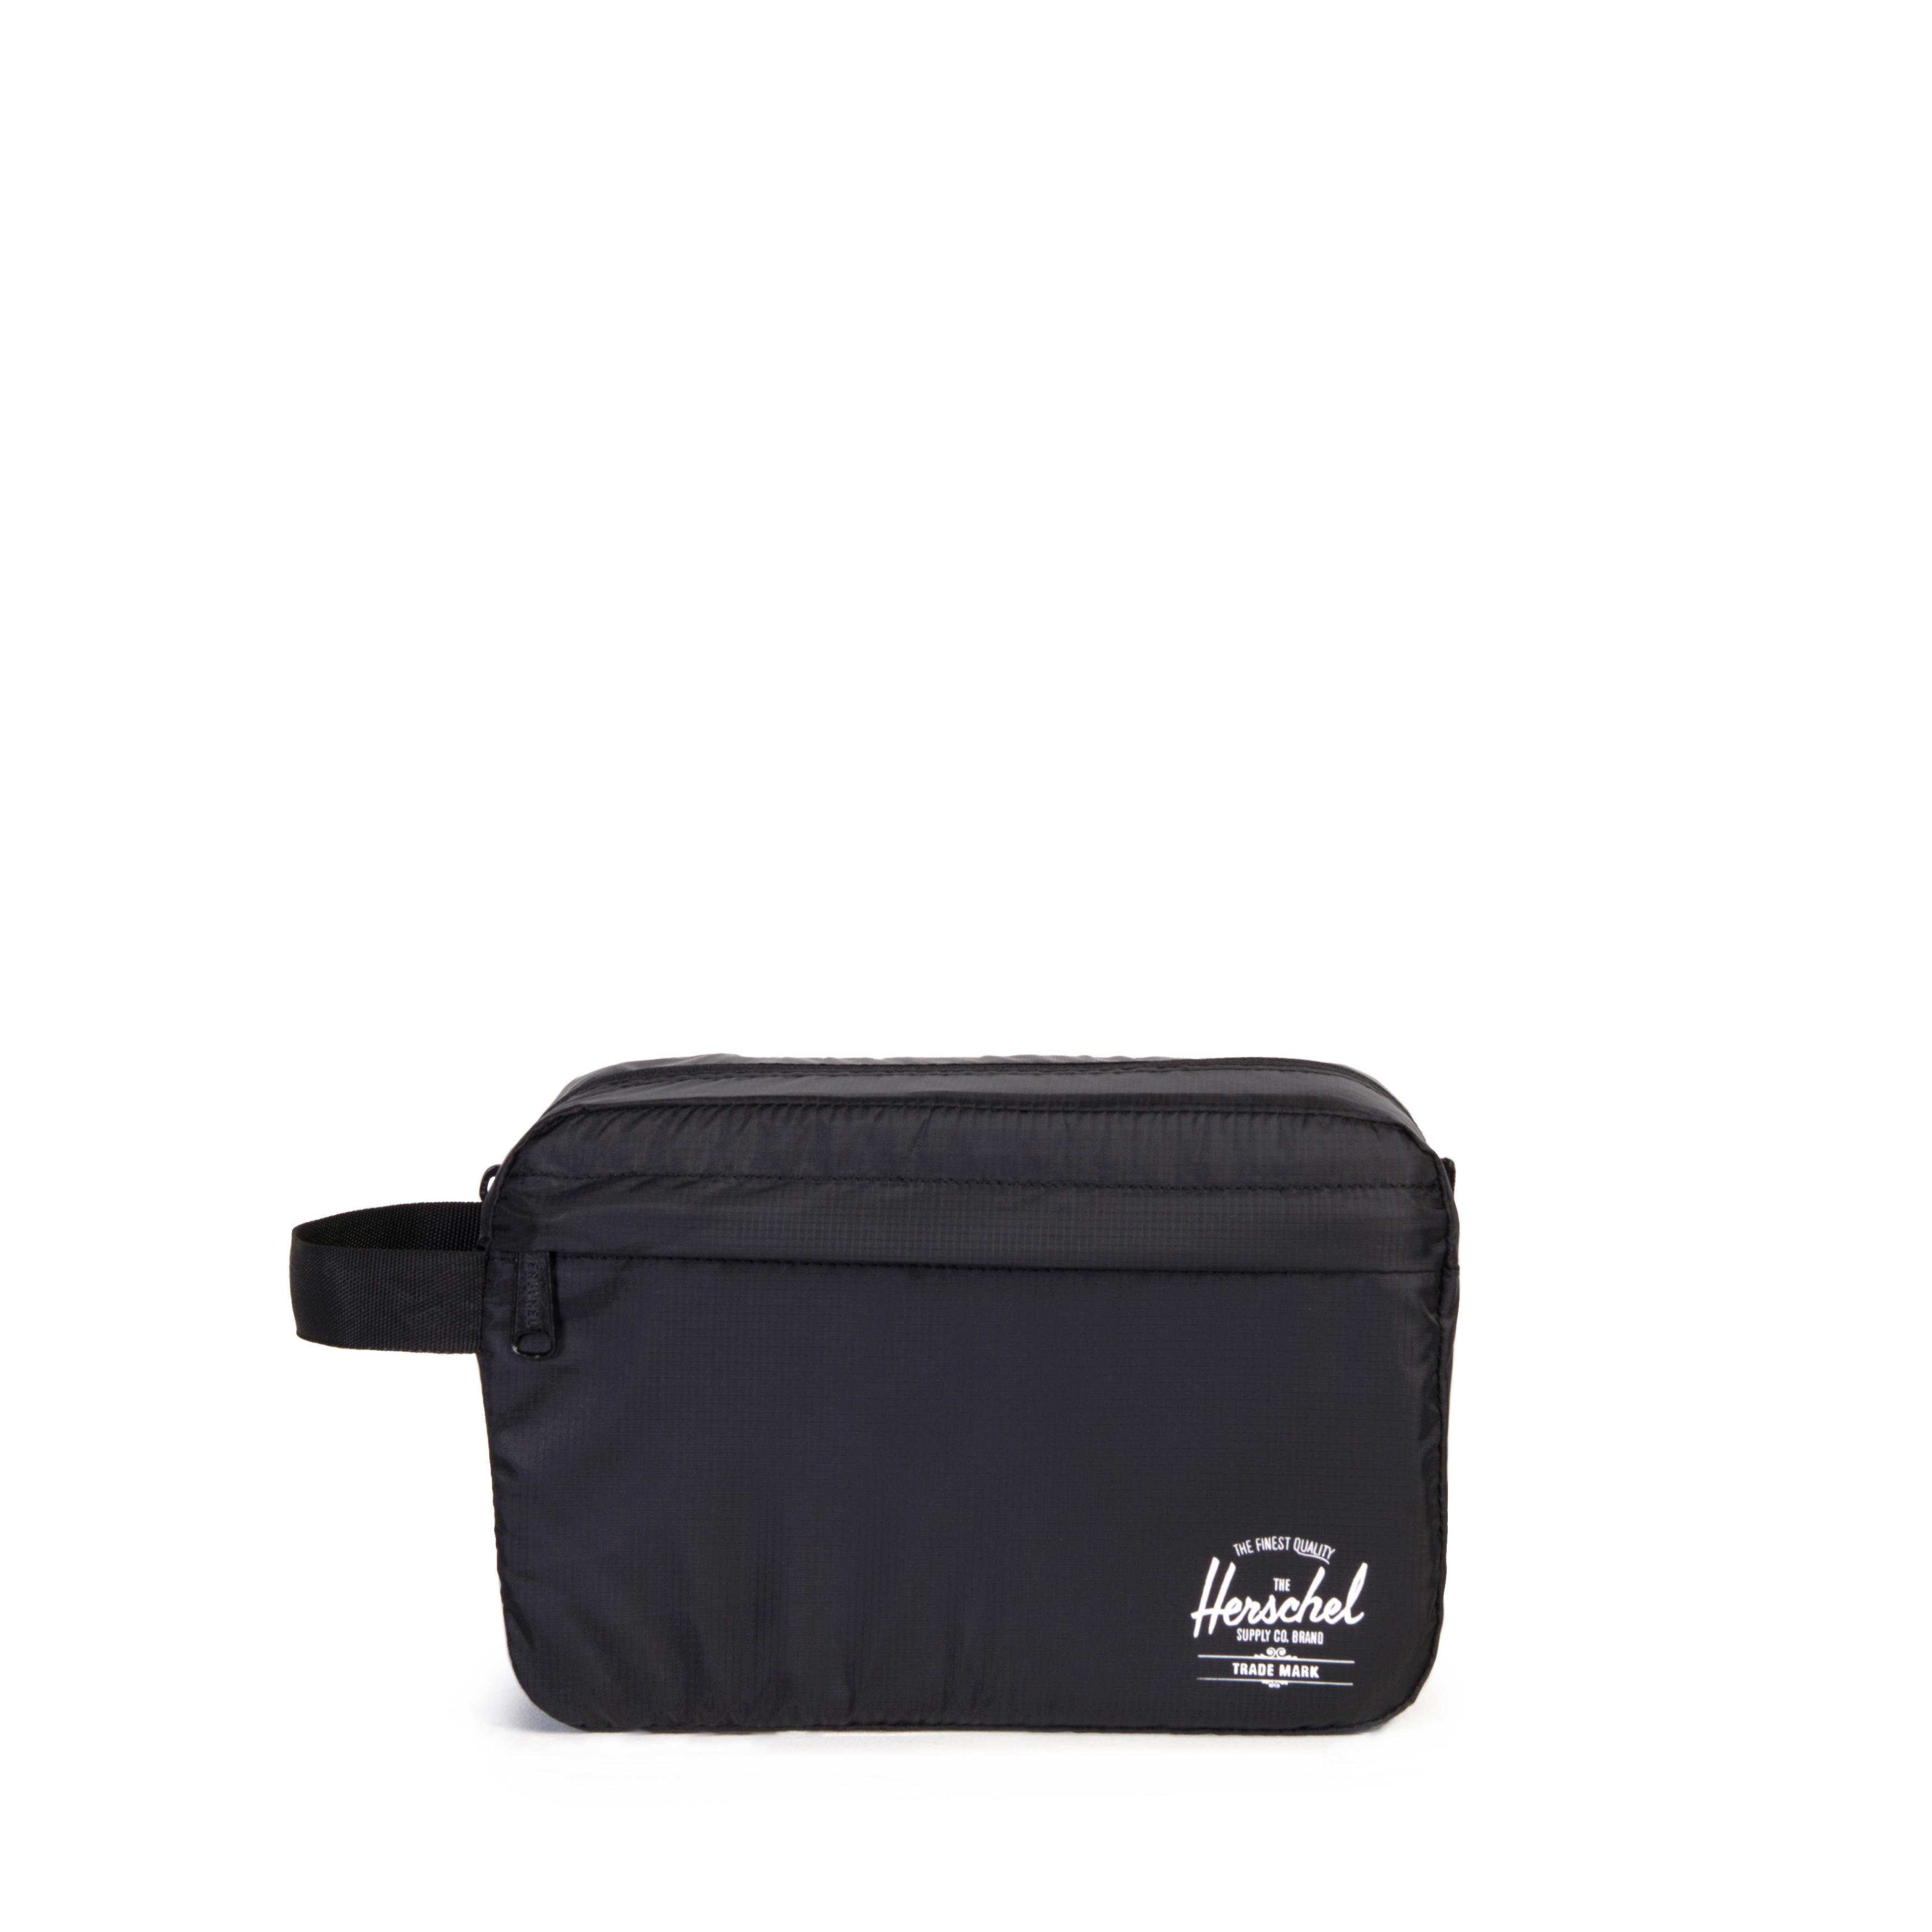 38d1c70c4d Toiletry Bag